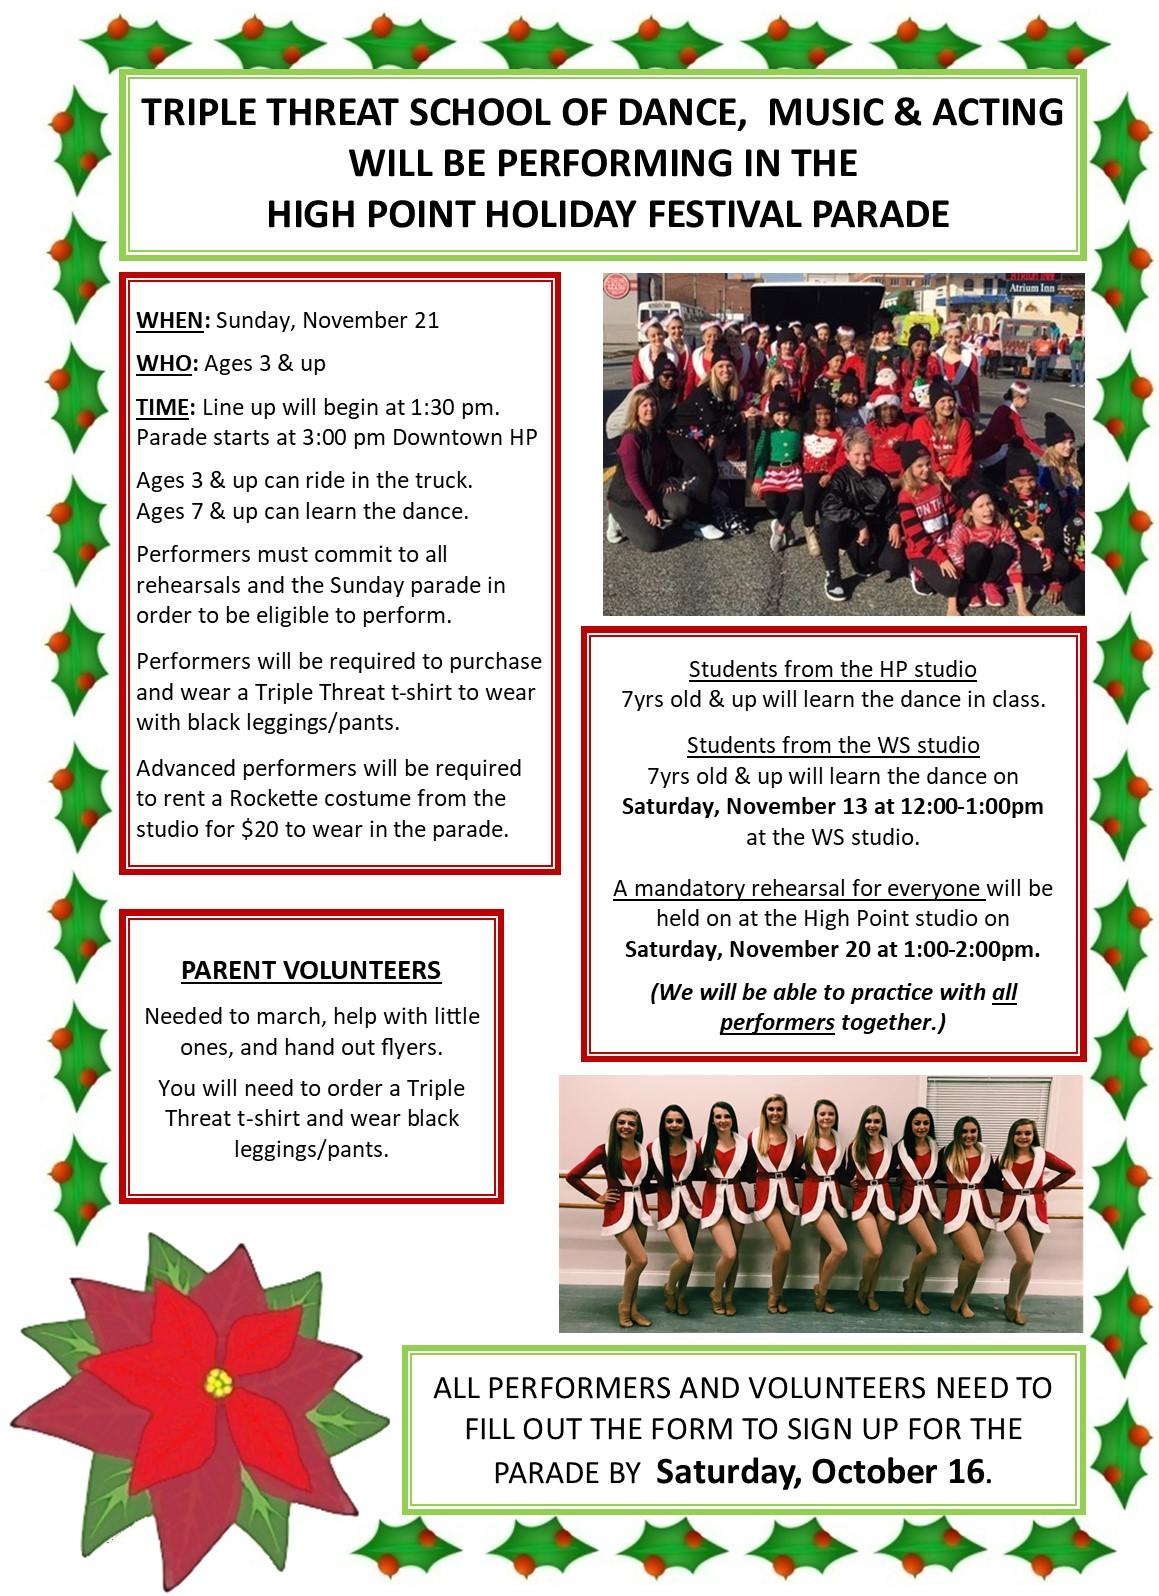 Dance Studio Holiday Parade Flyer 2021